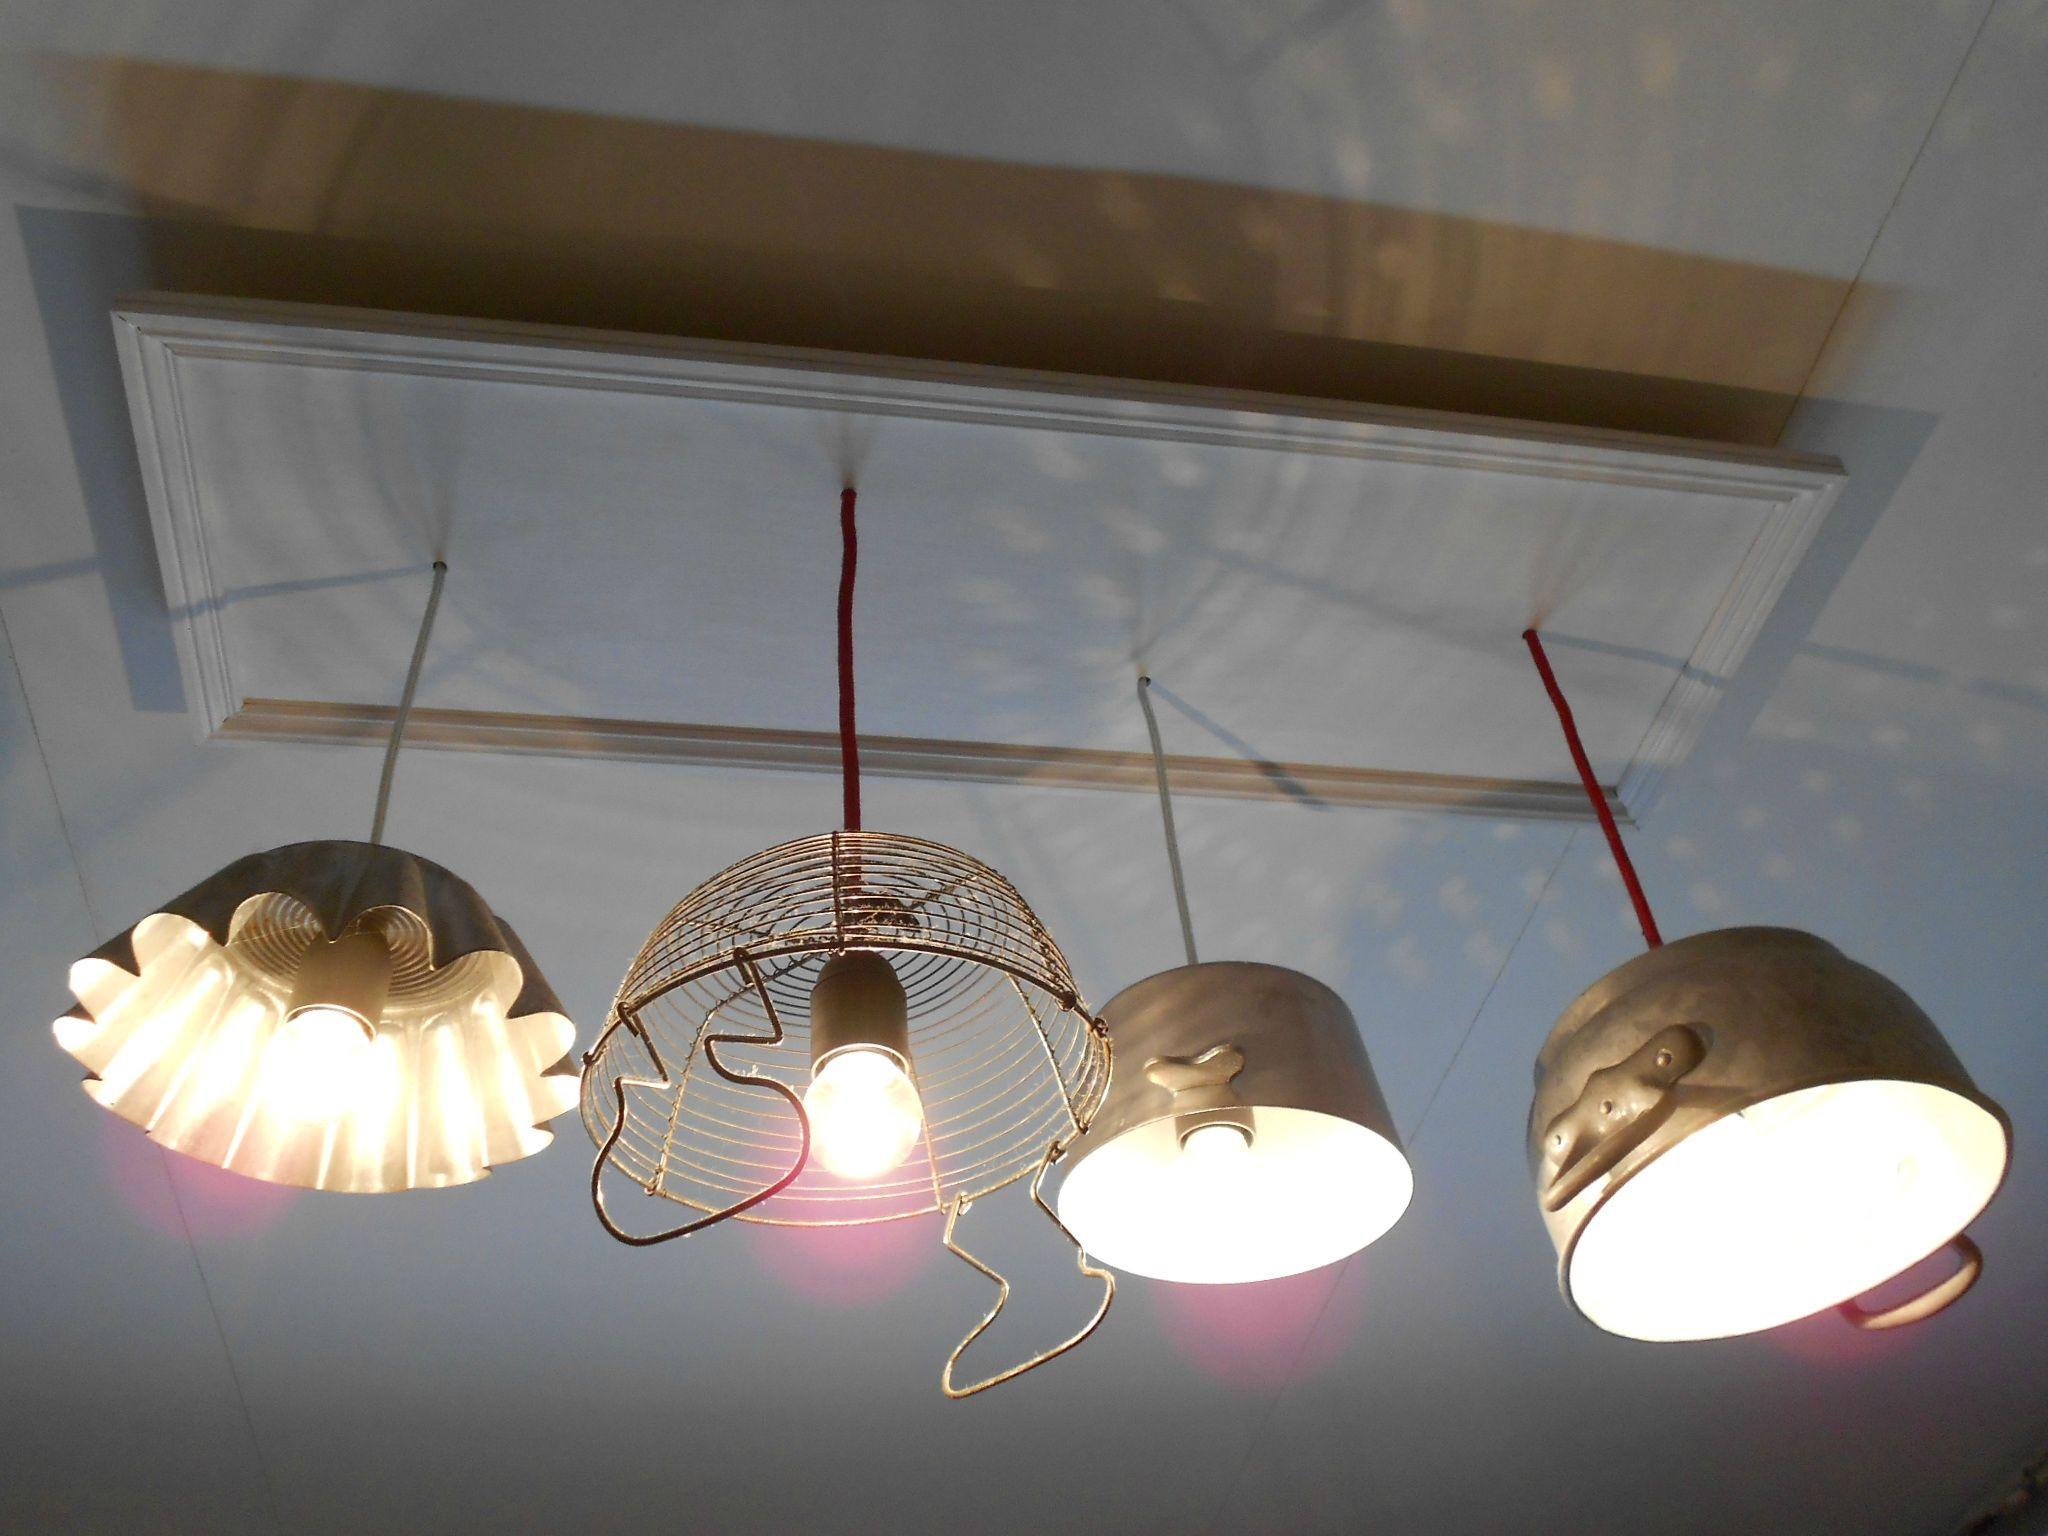 59821599bdfdaca8e2d7797abdfa03ae Résultat Supérieur 60 Beau Lampe Cloche Galerie 2018 Hdj5